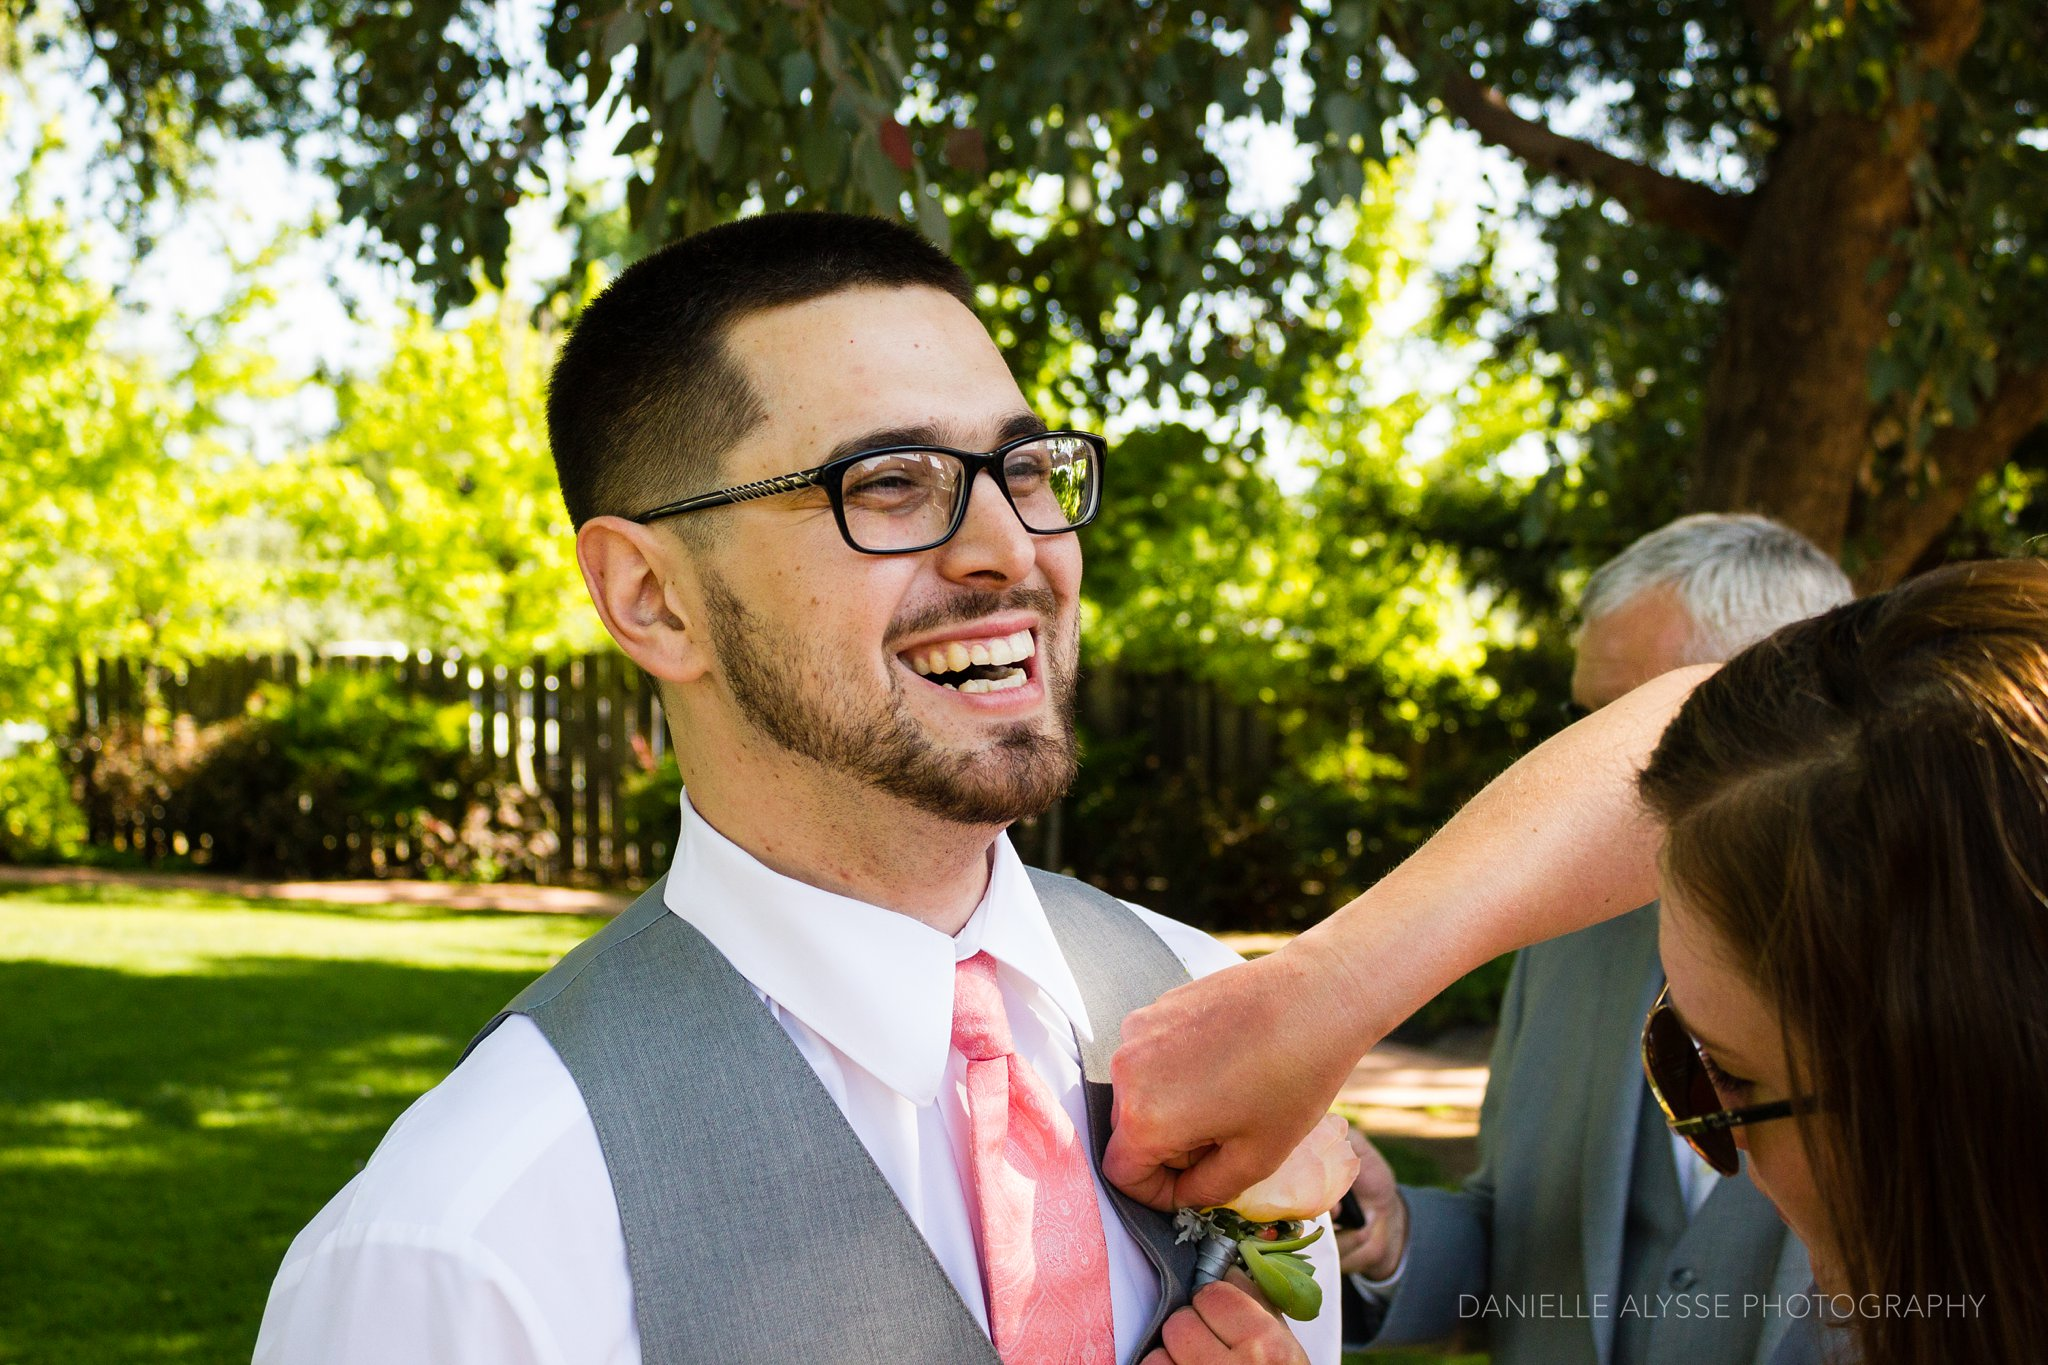 170507_blog_megan_david_wedding_loomis_flower_farm_inn_danielle_alysse_photography_sacramento_photographer0118_WEB.jpg